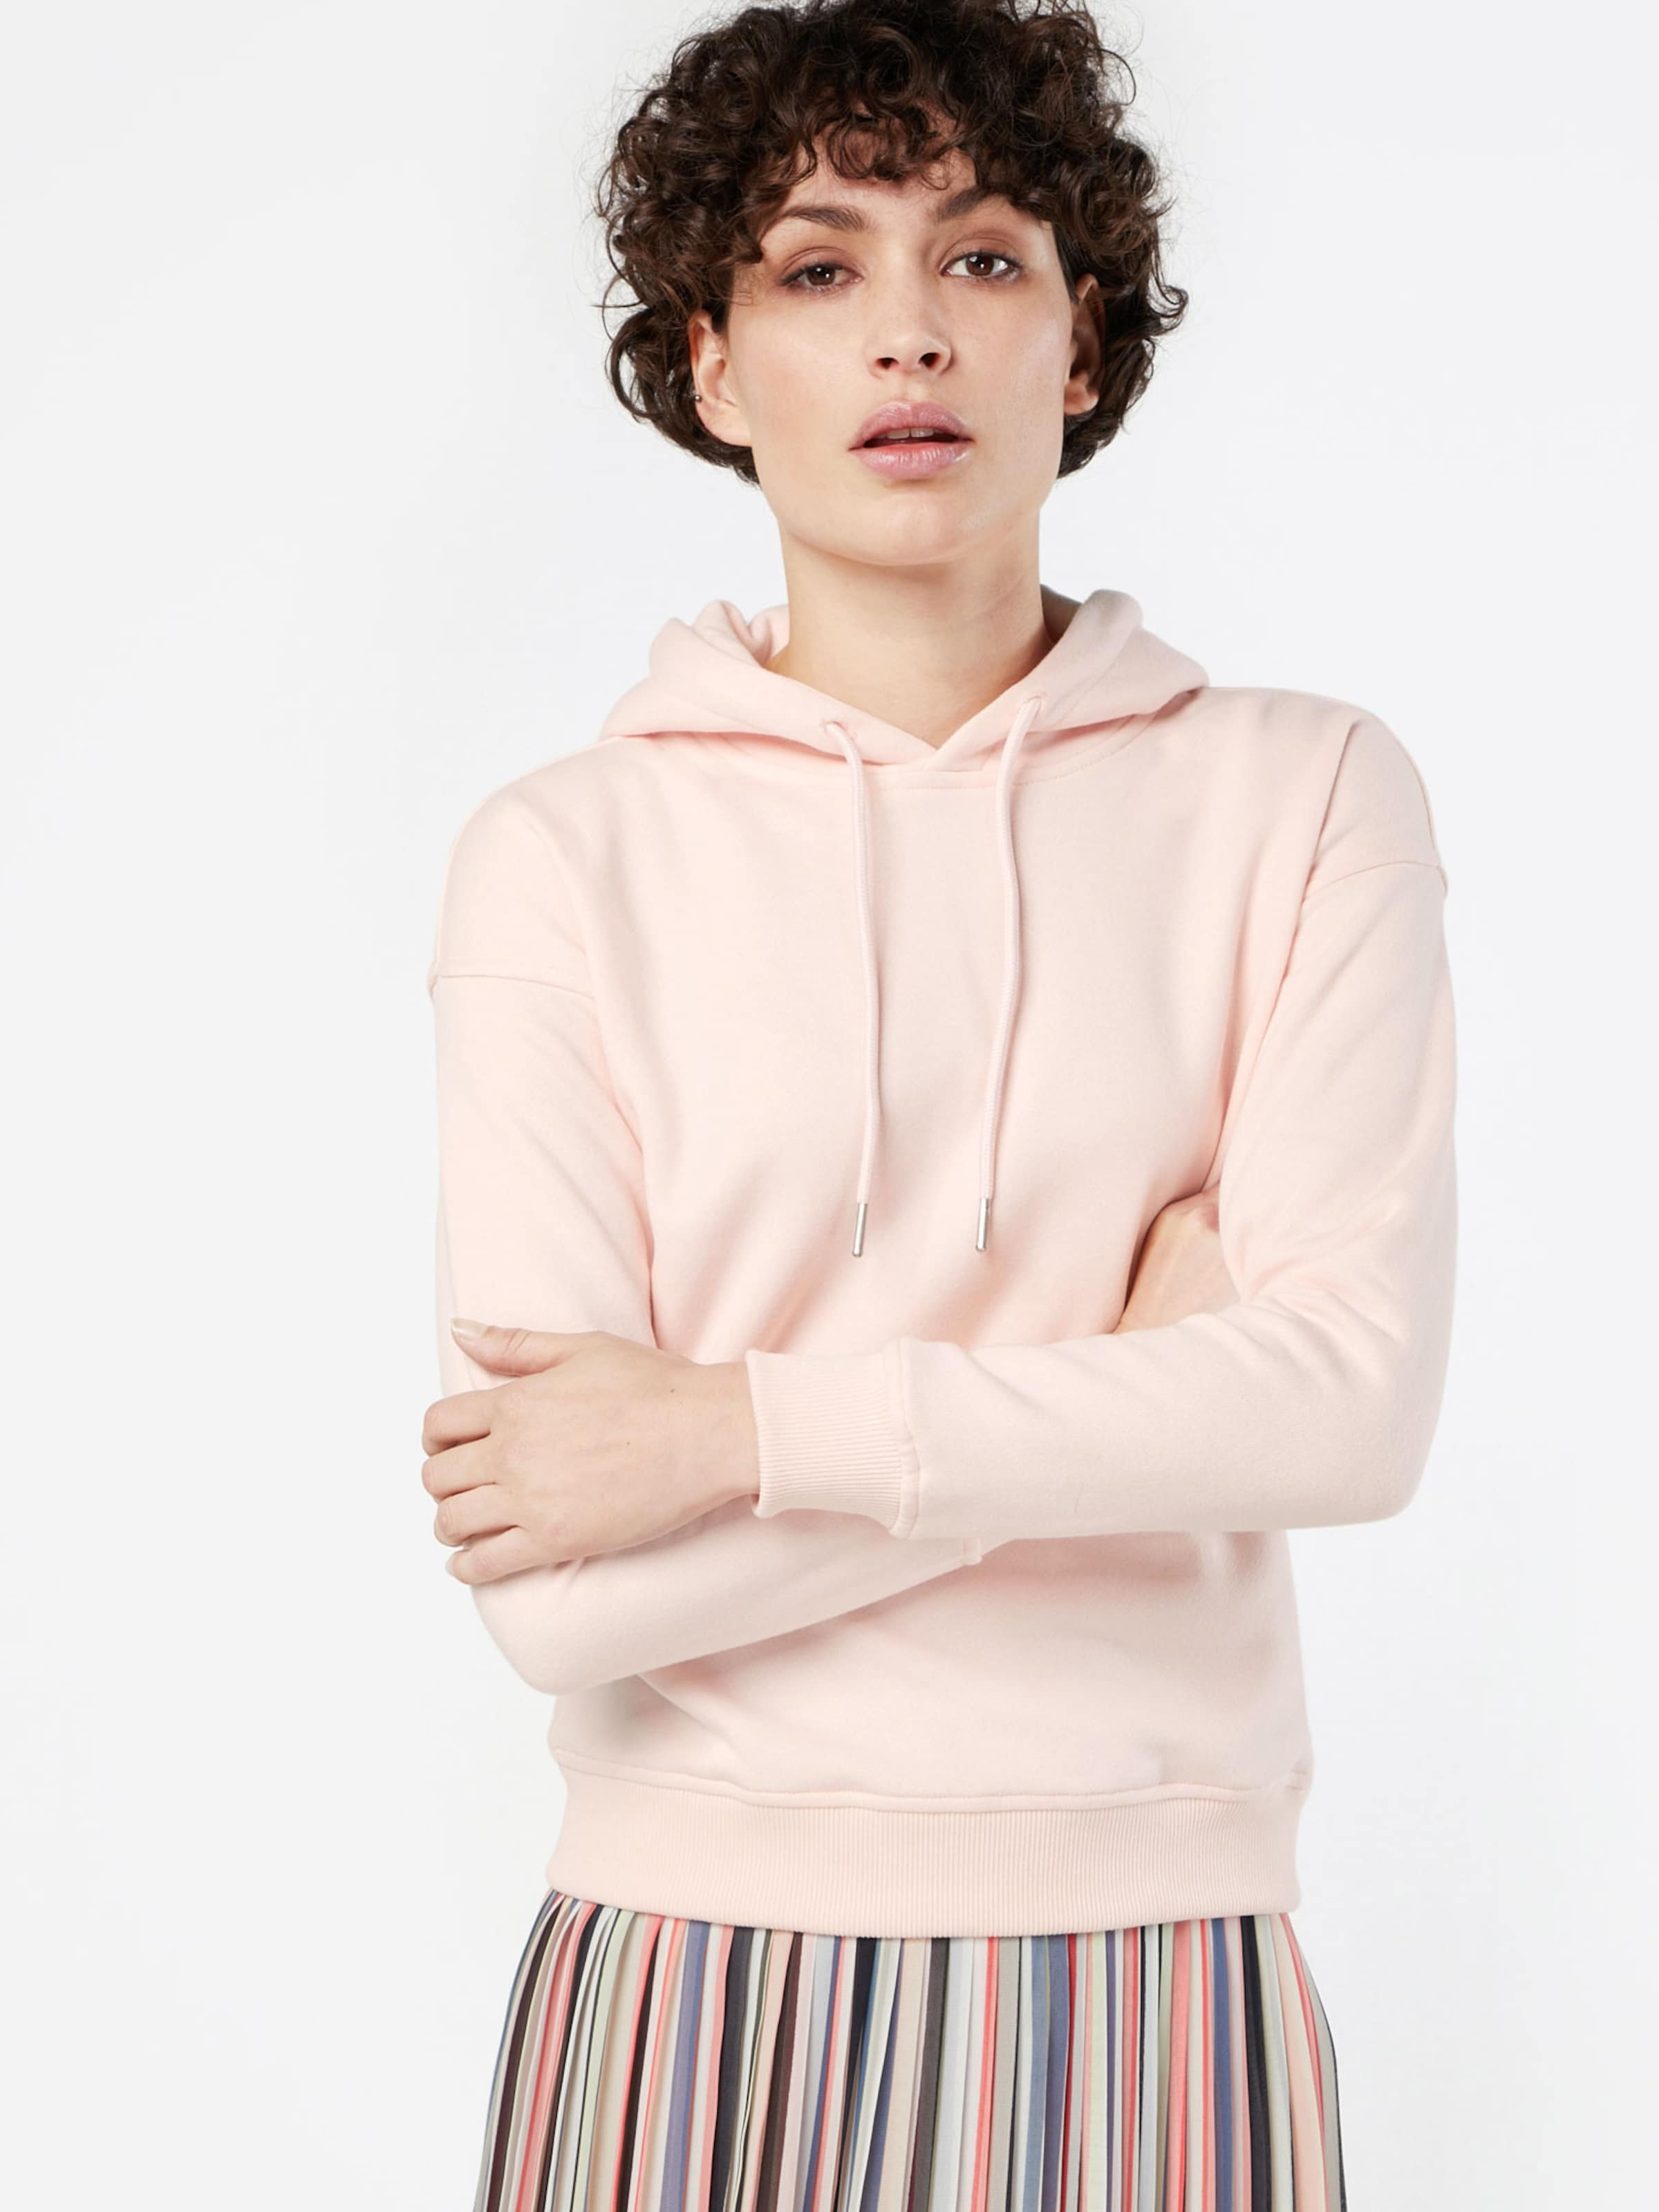 Classics Sweatshirt In Puder Classics Urban Sweatshirt Urban Classics In Puder Urban Yb76gfy